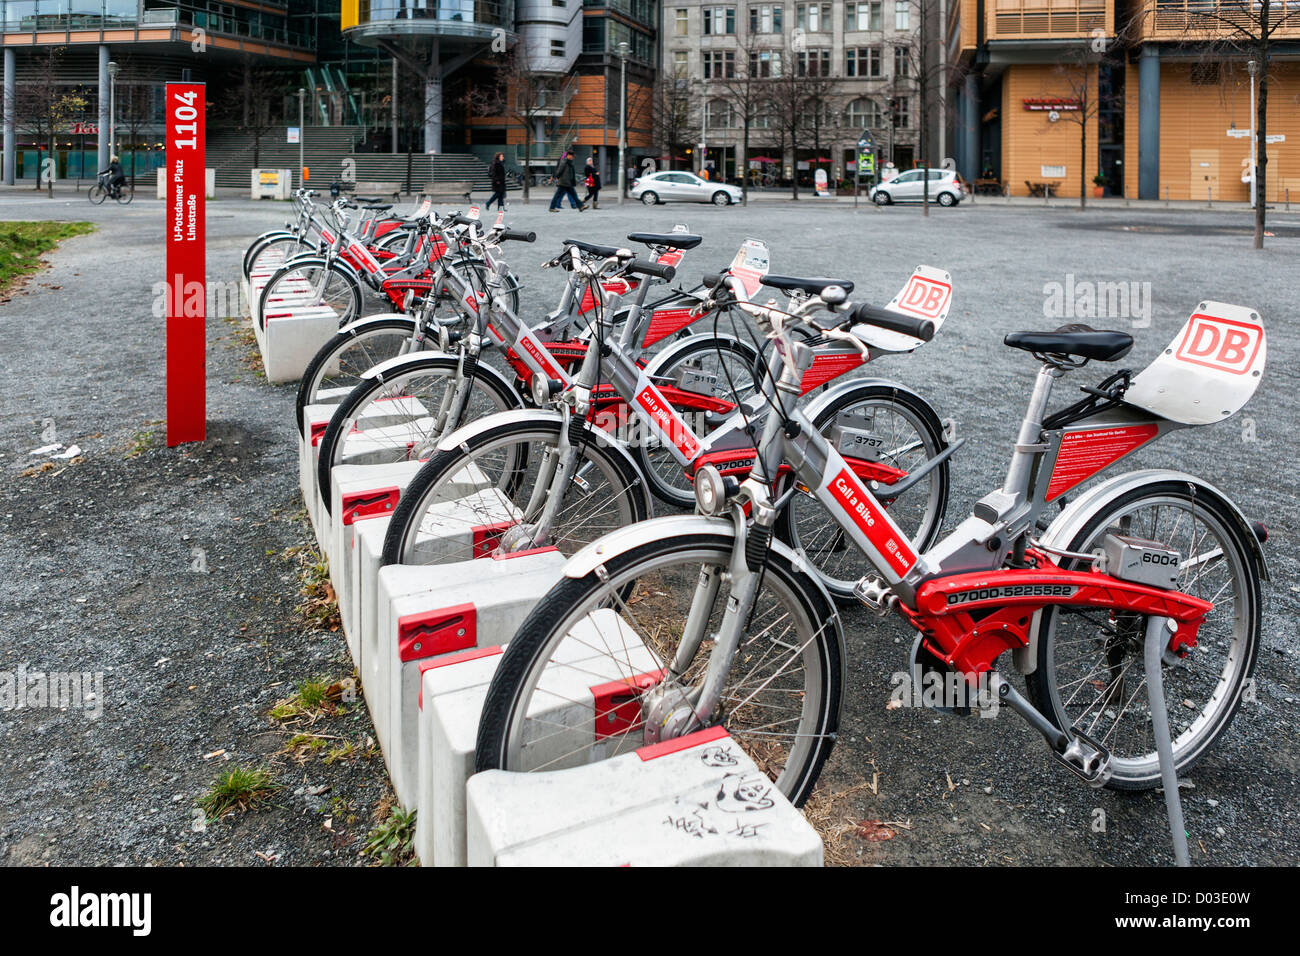 Rote Deutsche Bahn Fahrräder am Potsdamer Platz, Berlin Stockbild